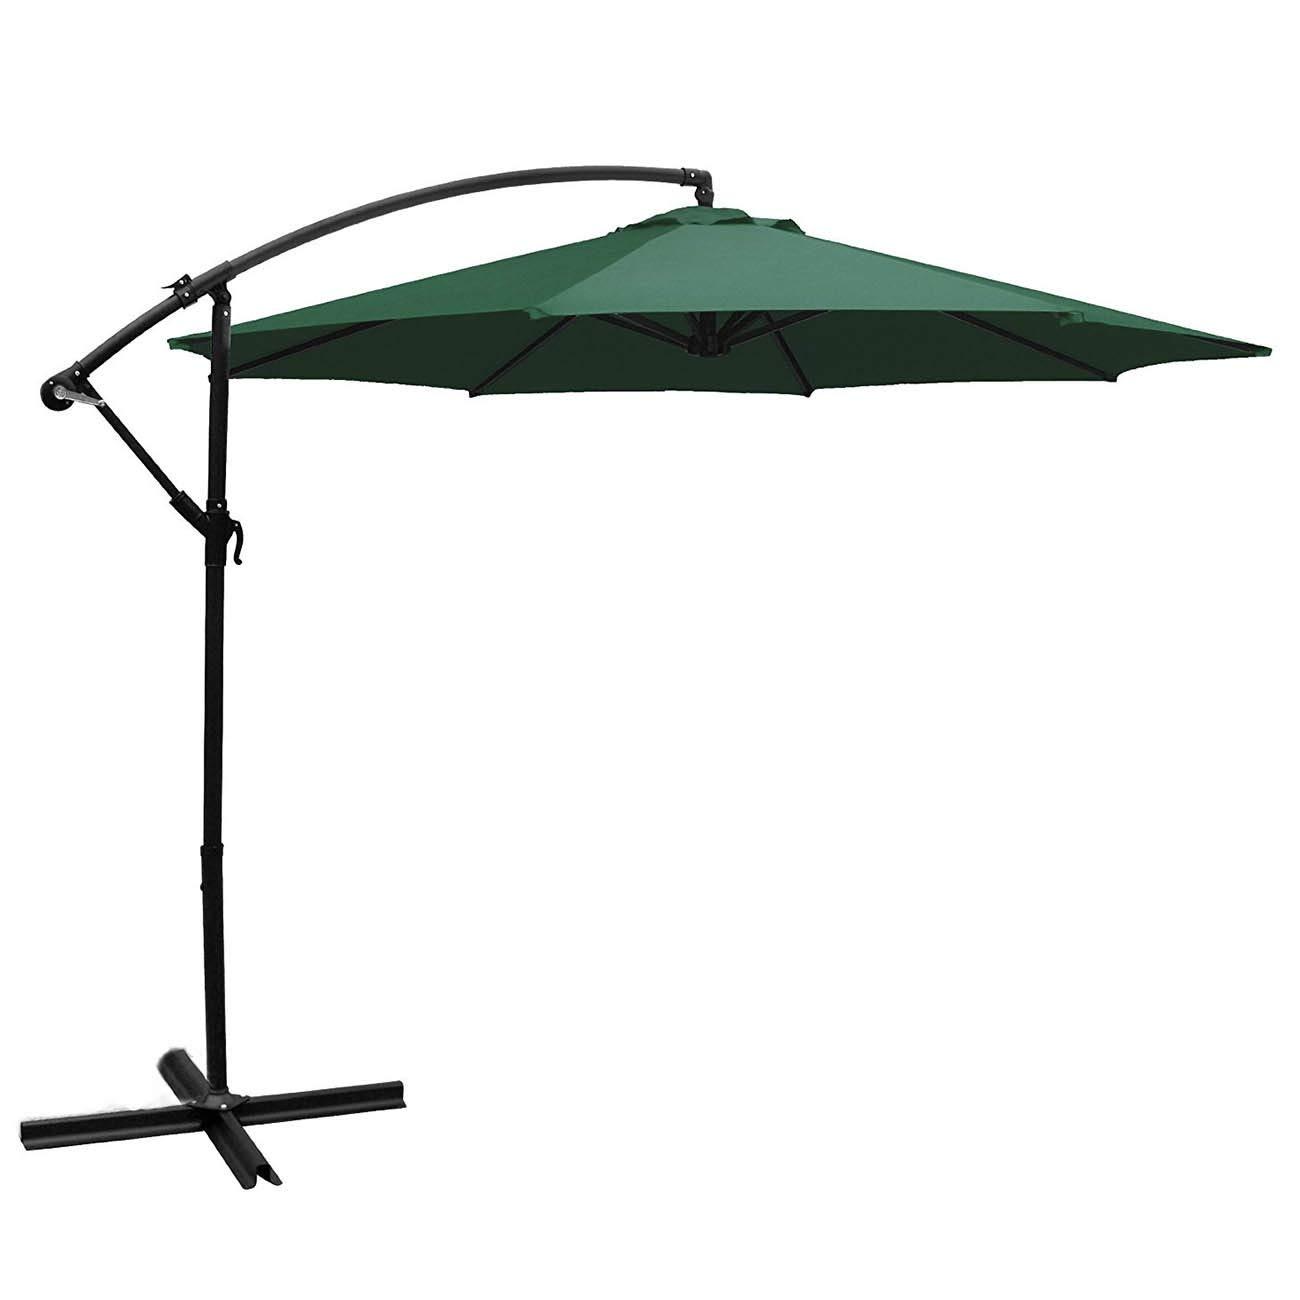 Amazon com : Belleze Patio Offset Cantilever Umbrella 10